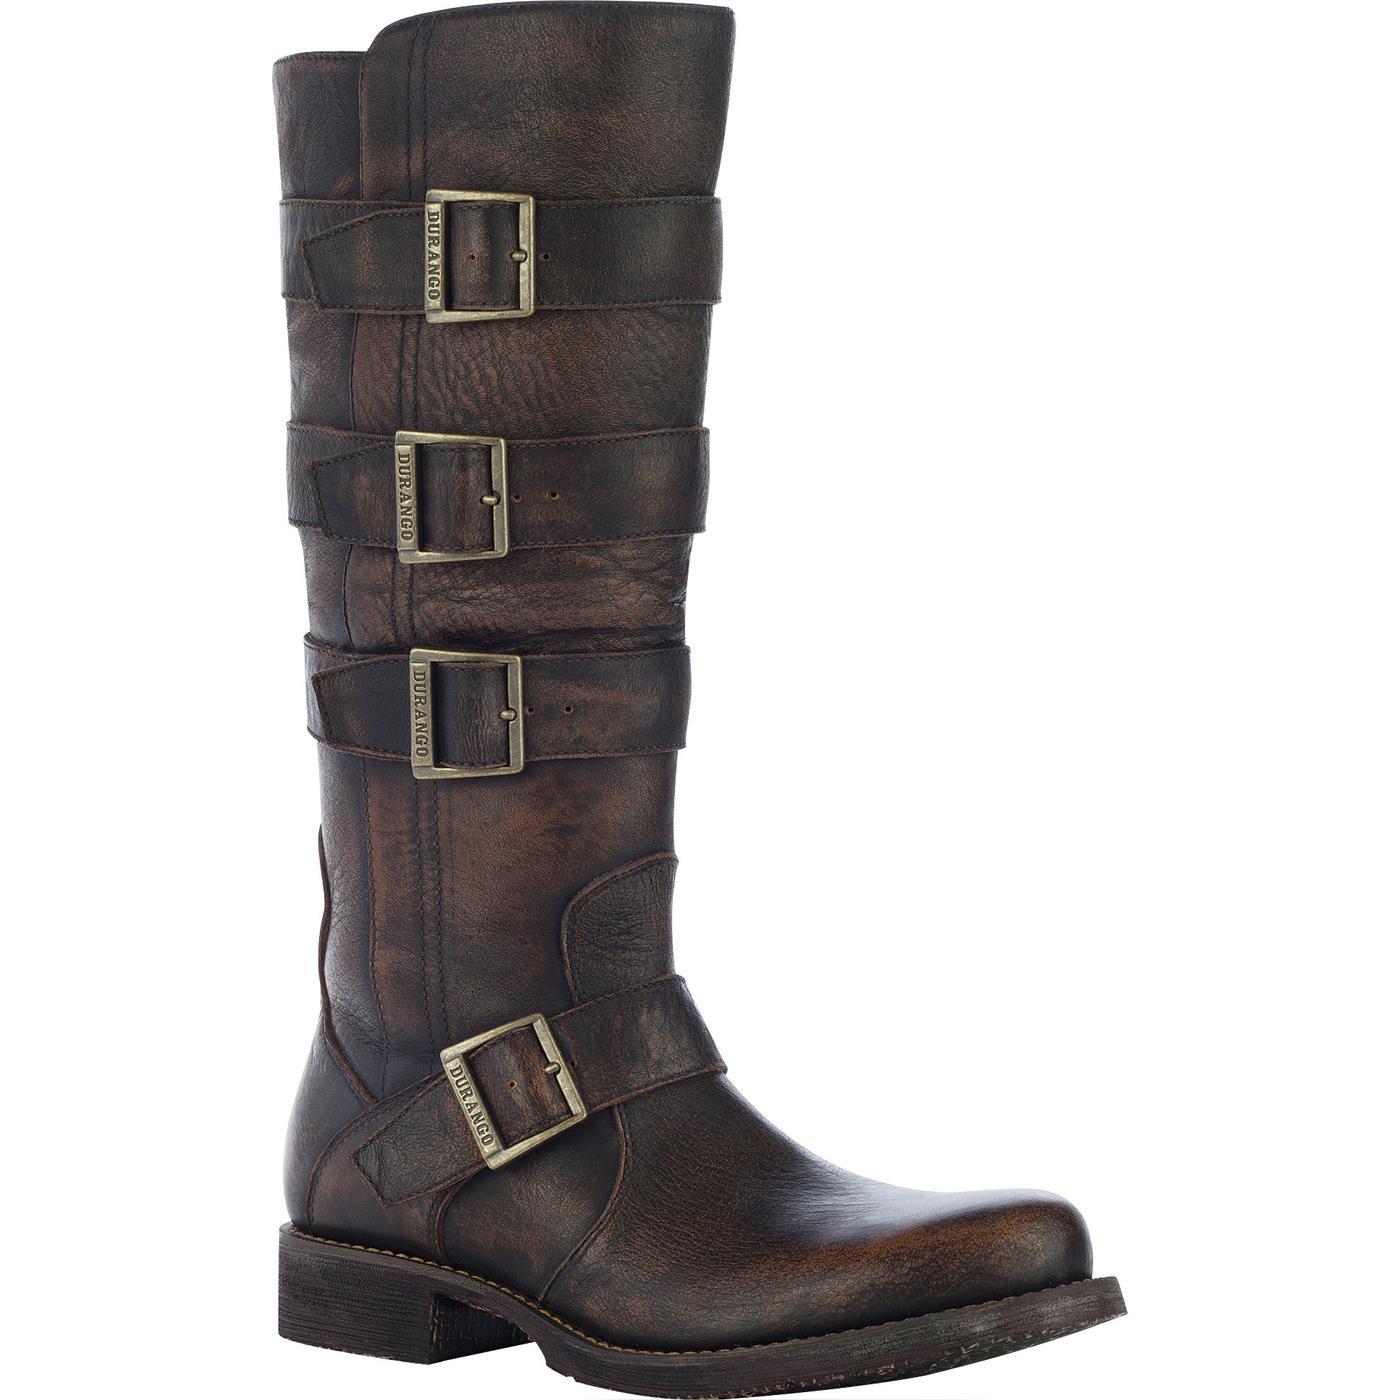 Durango City Savannah Women S Engineer Leather Boots Rd0574